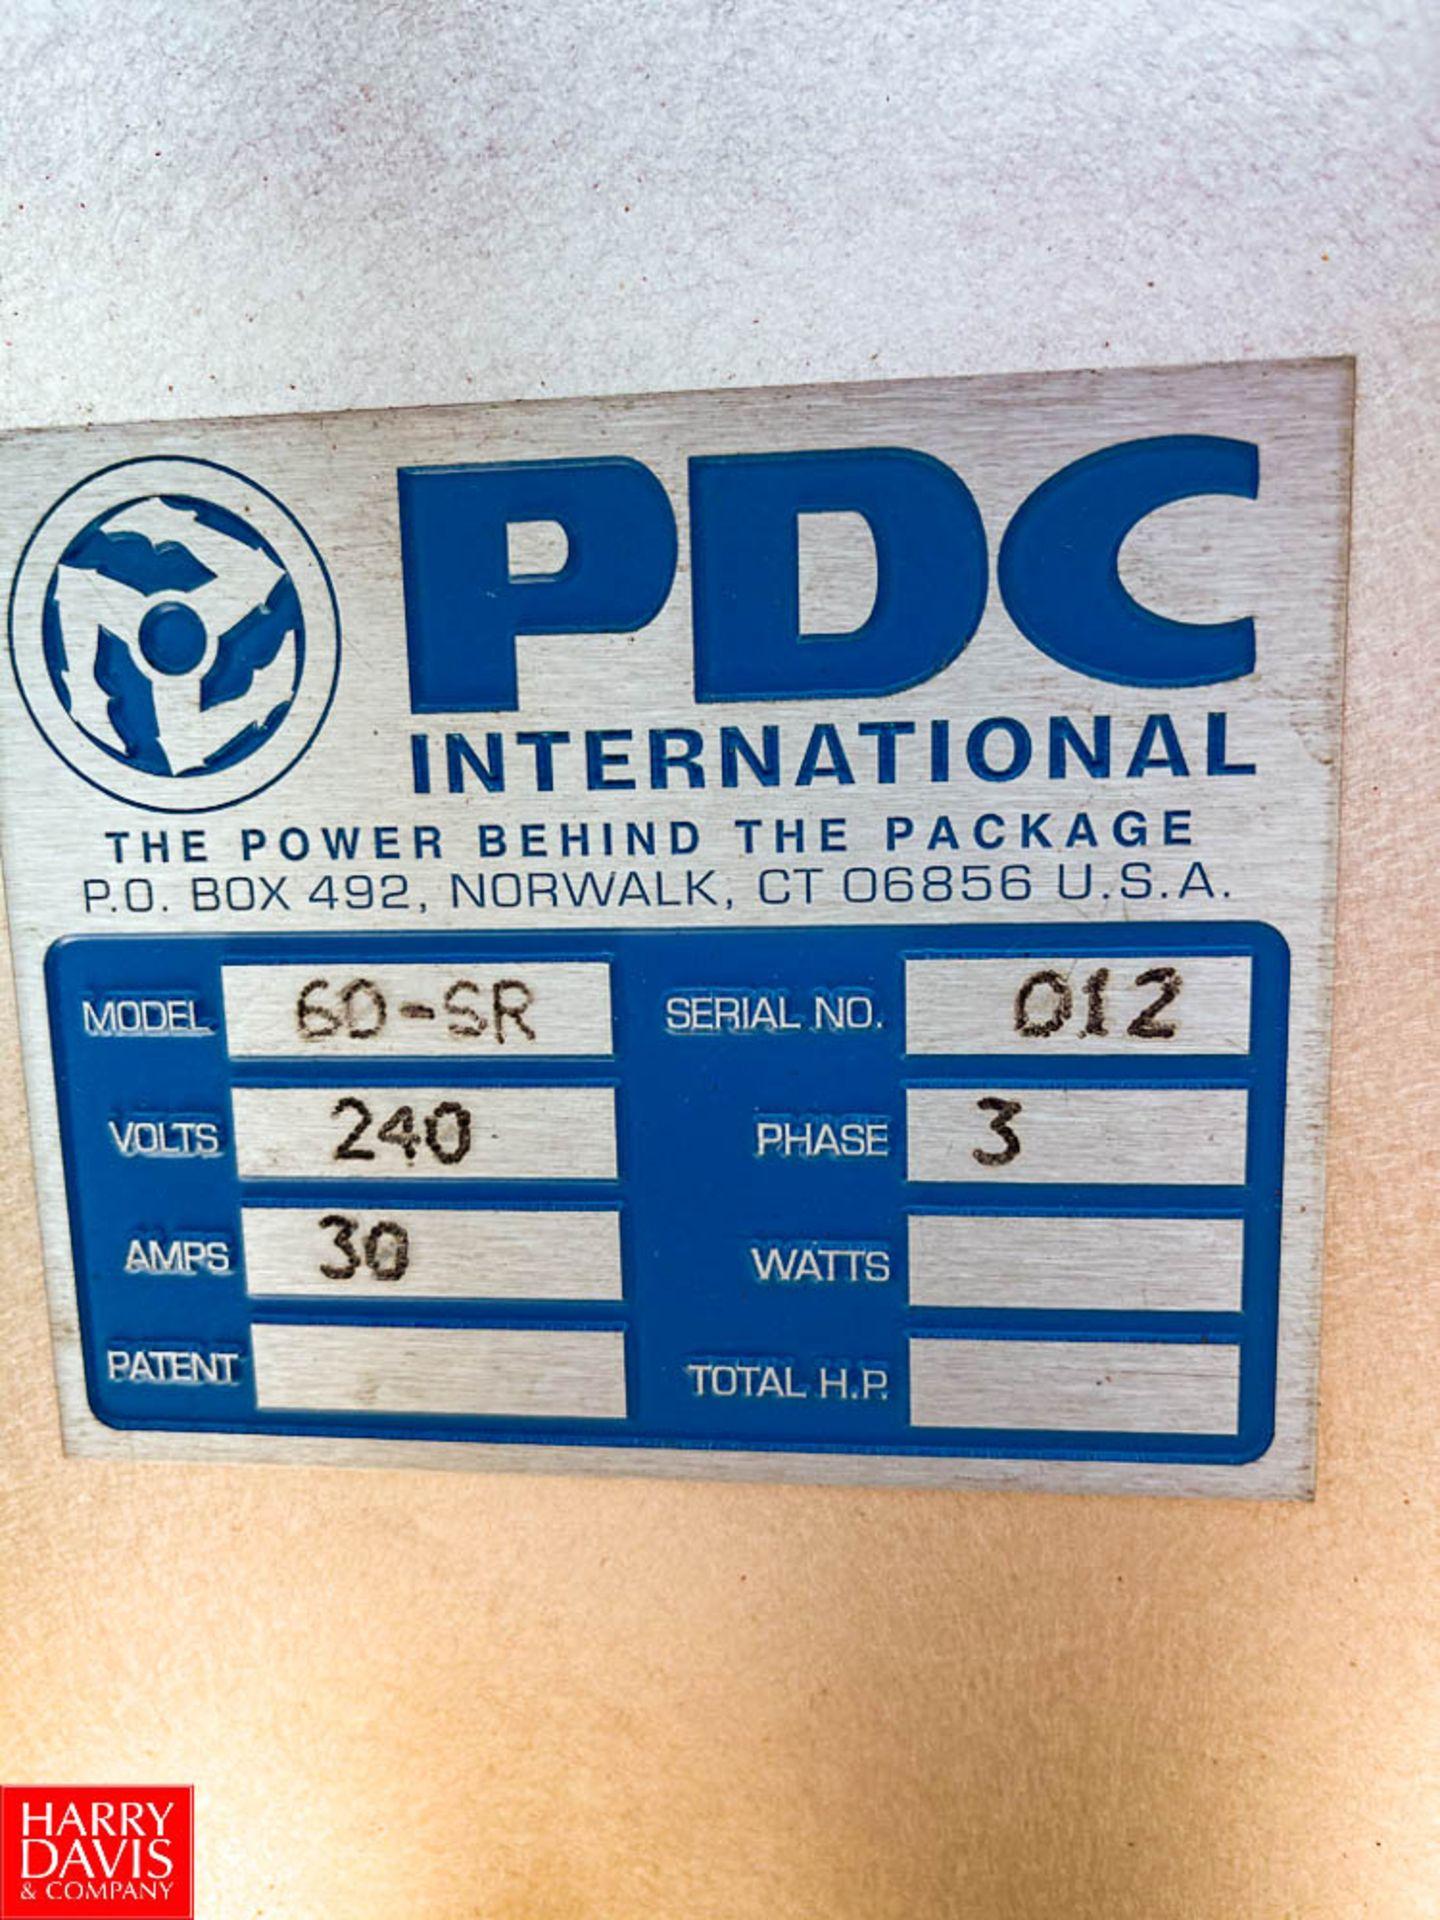 PDC Shrink Sleever Model: 60-SR : SN 012 Rigging Fee: $150 - Image 3 of 3